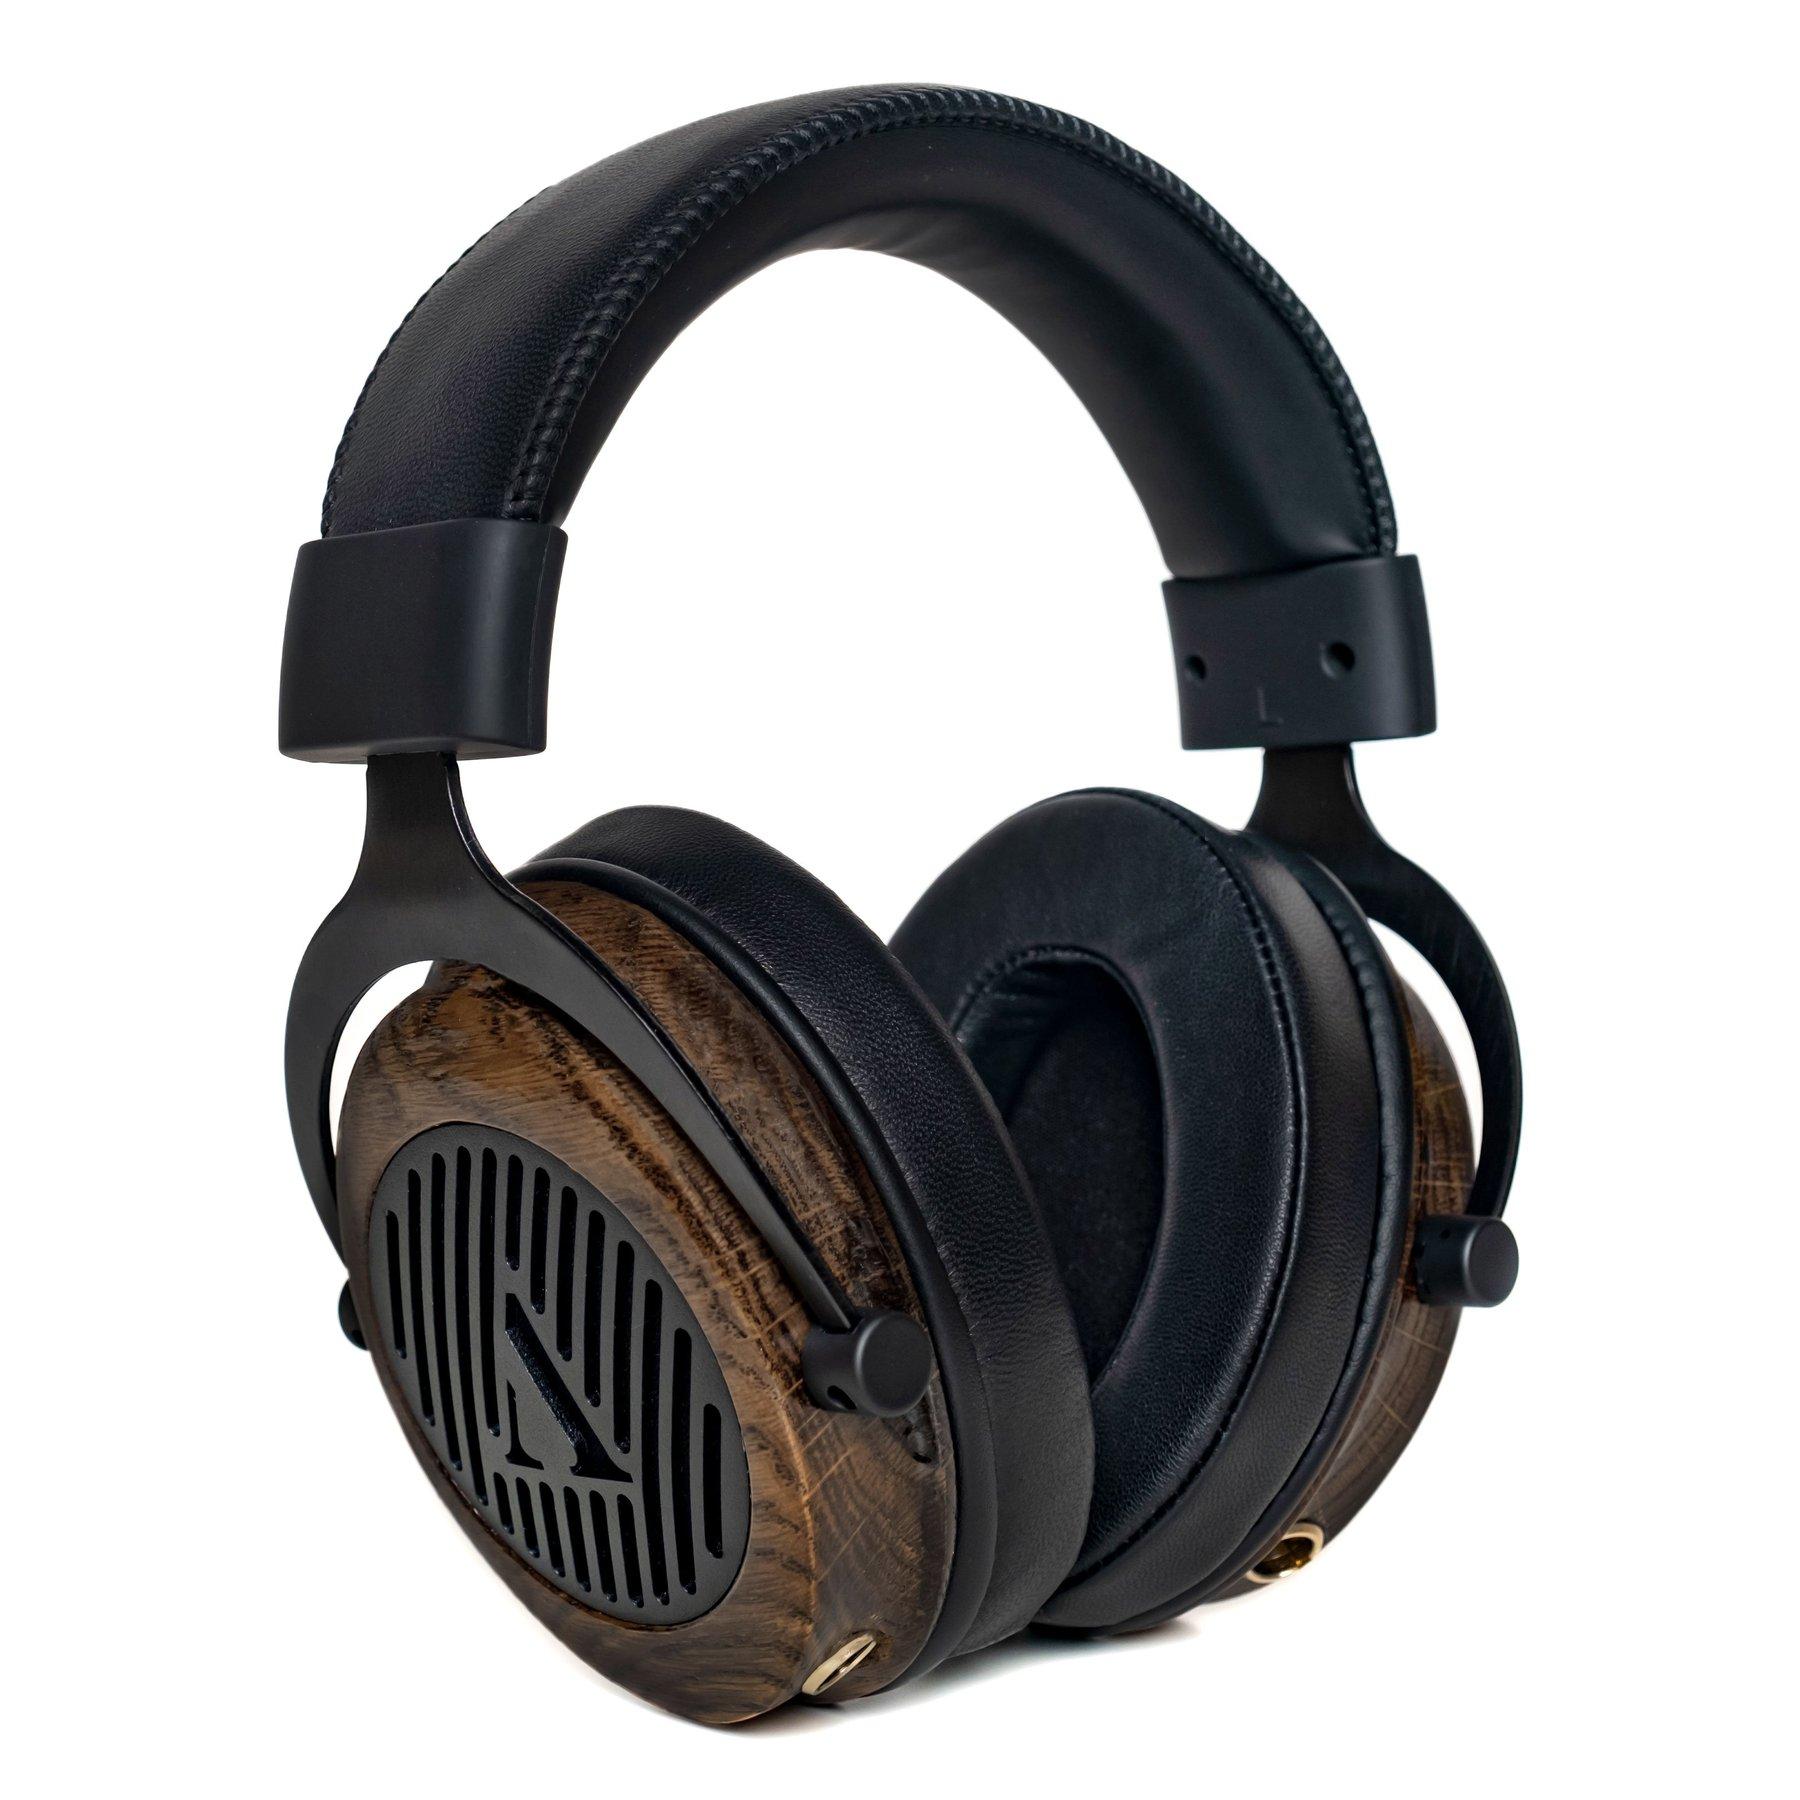 apos-audio-apos-headphone-apos-caspian-open-back-headphone-29712245686443_1800x1800.jpg